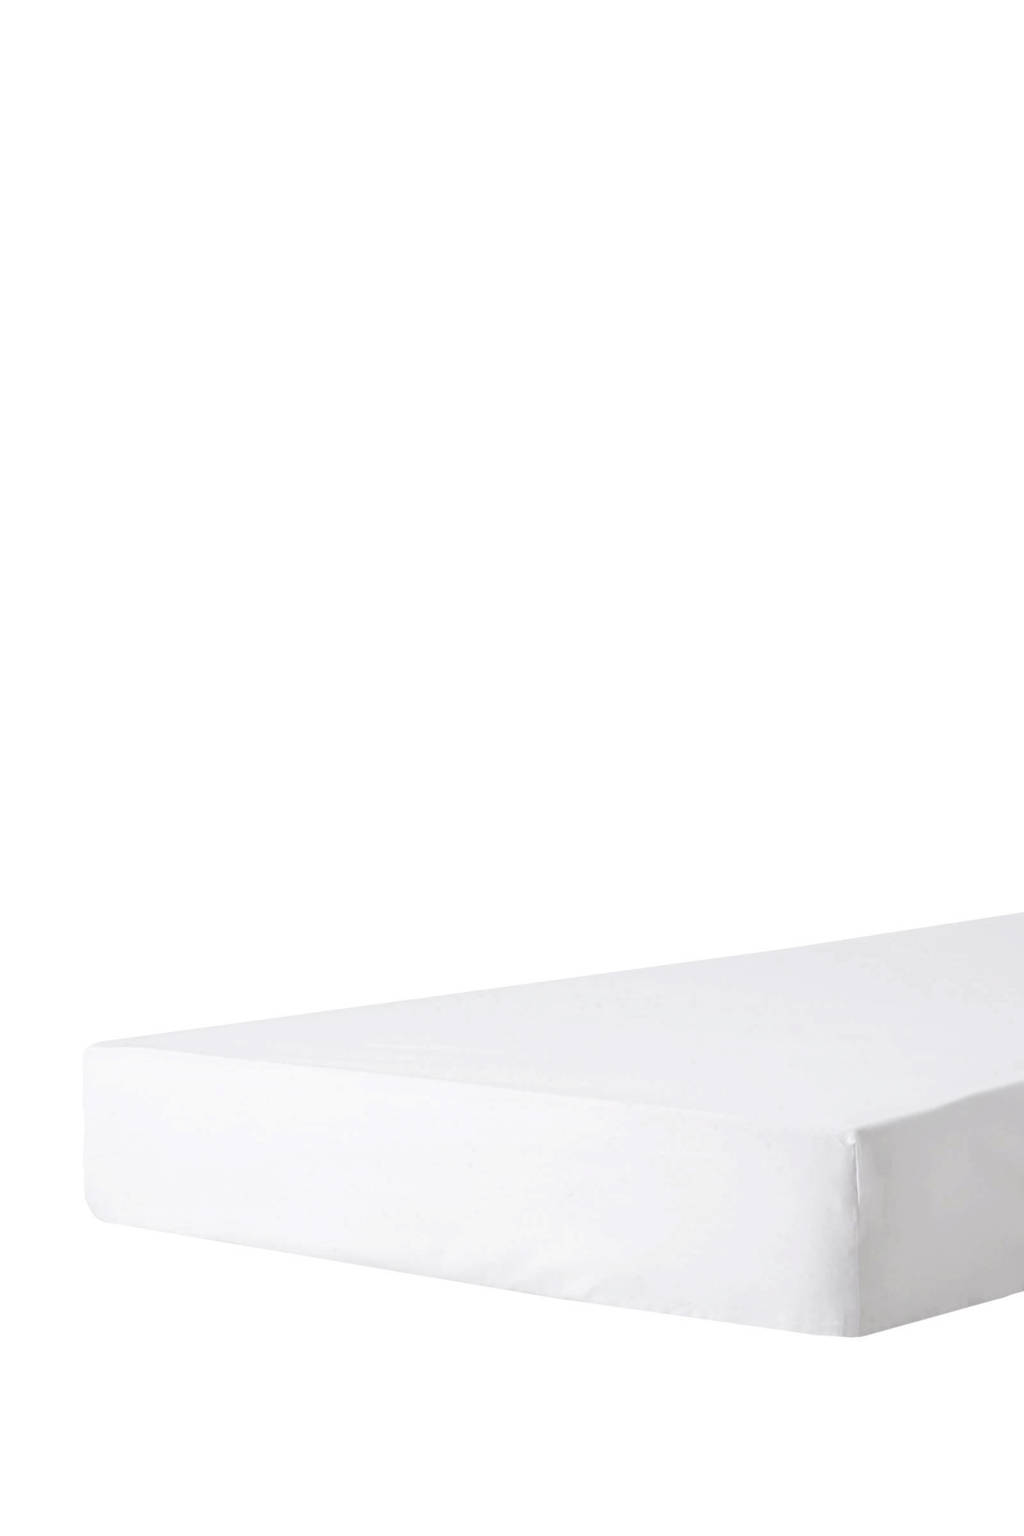 Beddinghouse perkalkatoenen hoeslaken Wit